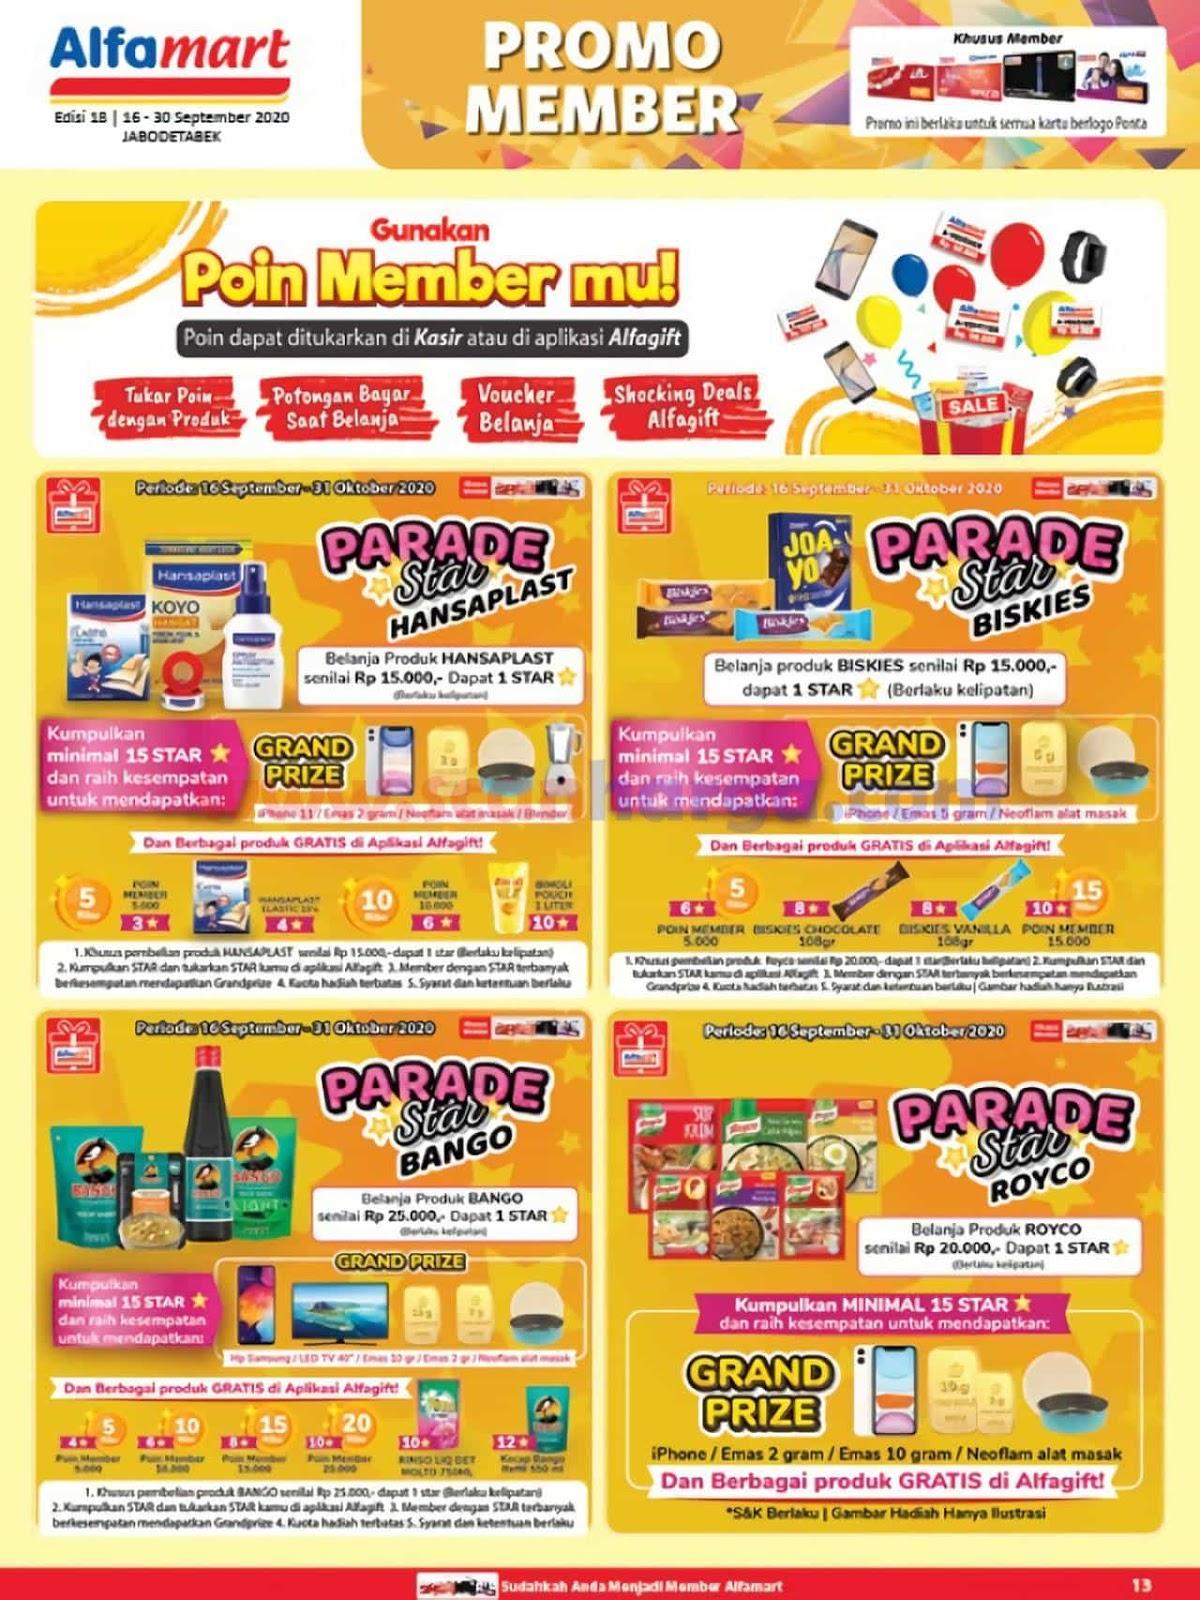 Katalog Promo Alfamart 16 - 30 September 2020 13